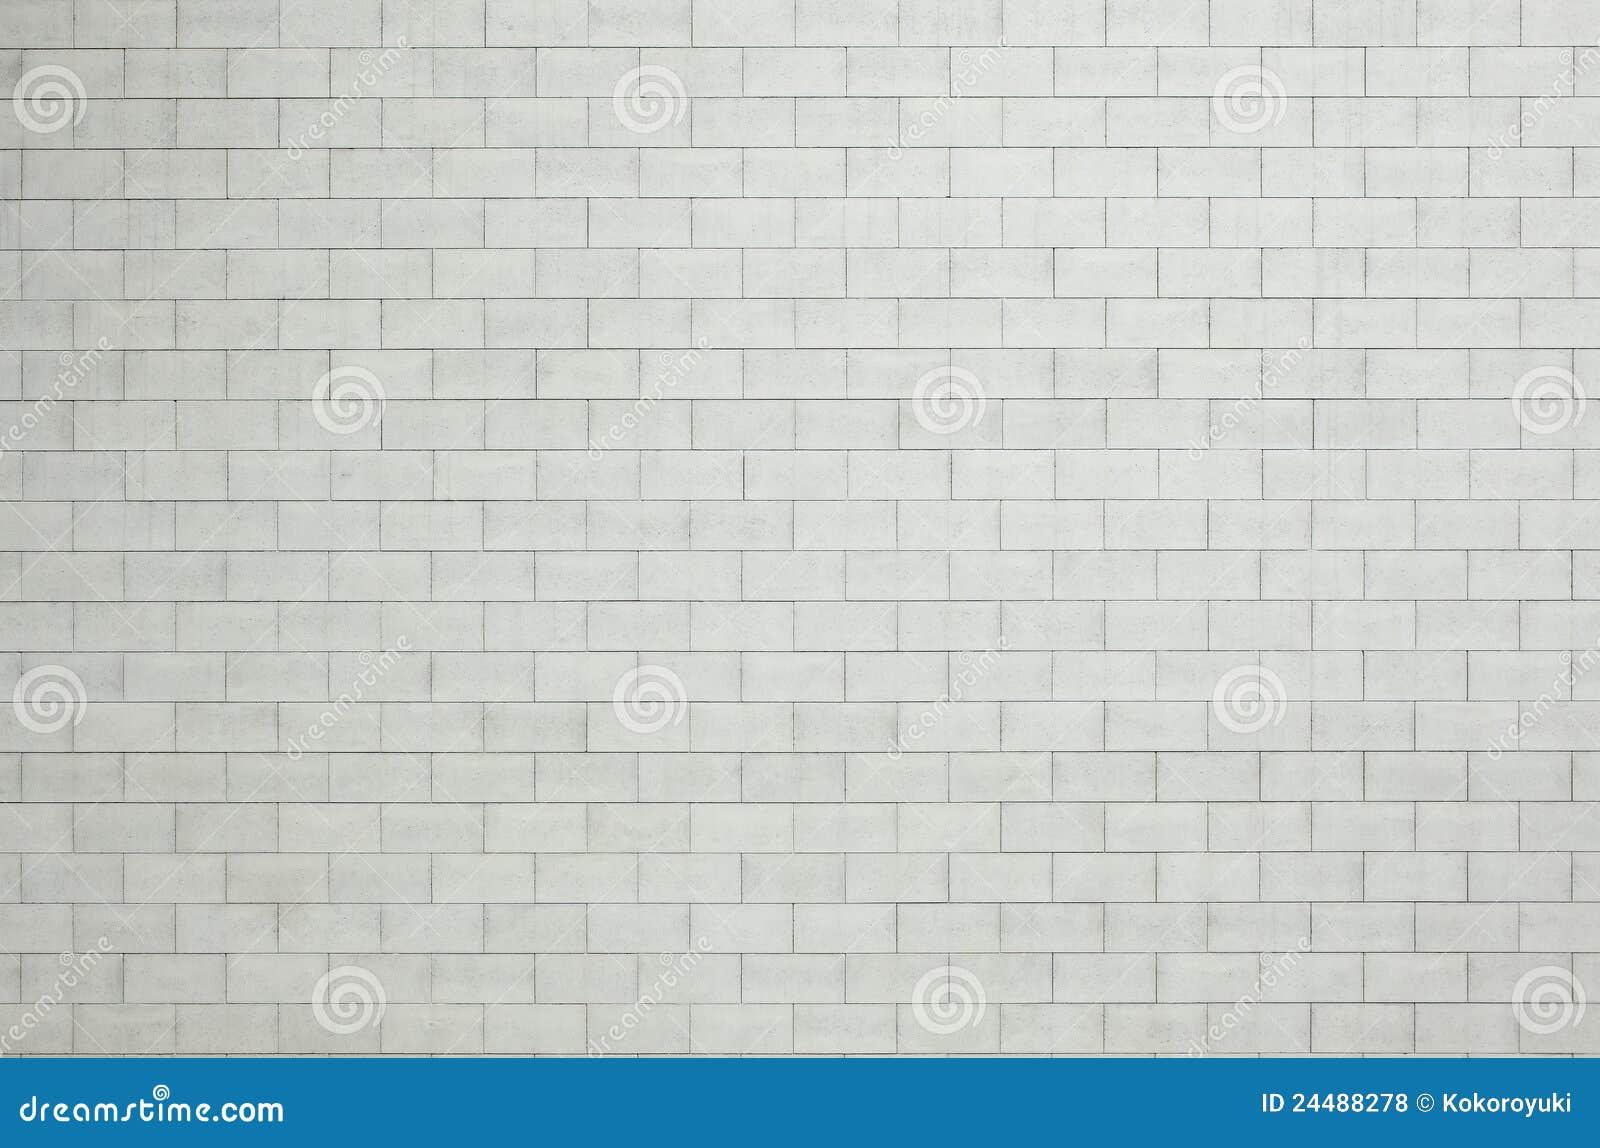 Concrete Block Wall Royalty Free Stock Photos Image